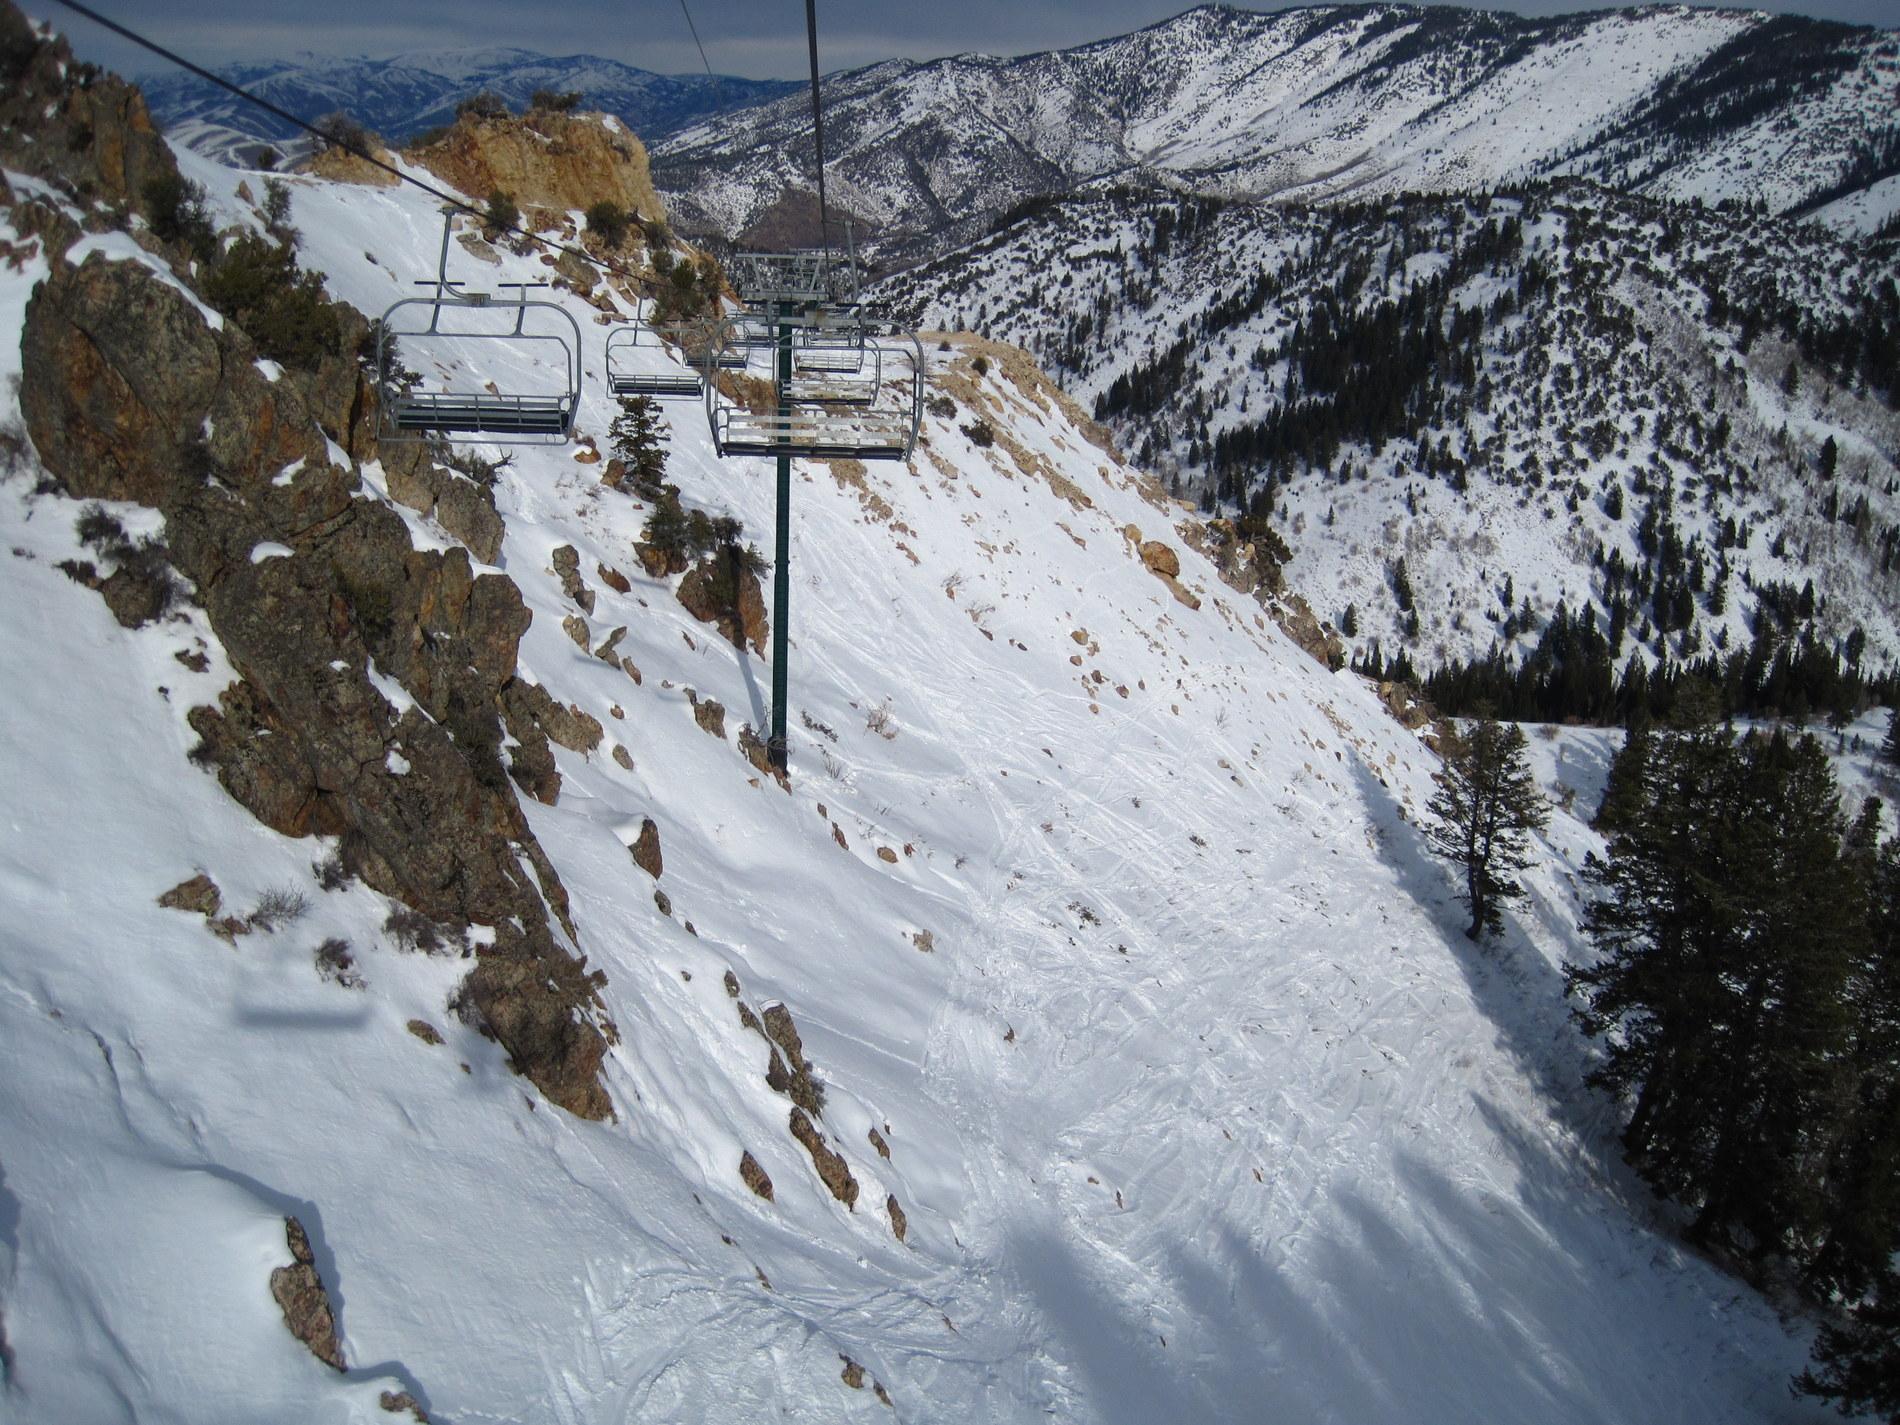 Powder-backside chute 2